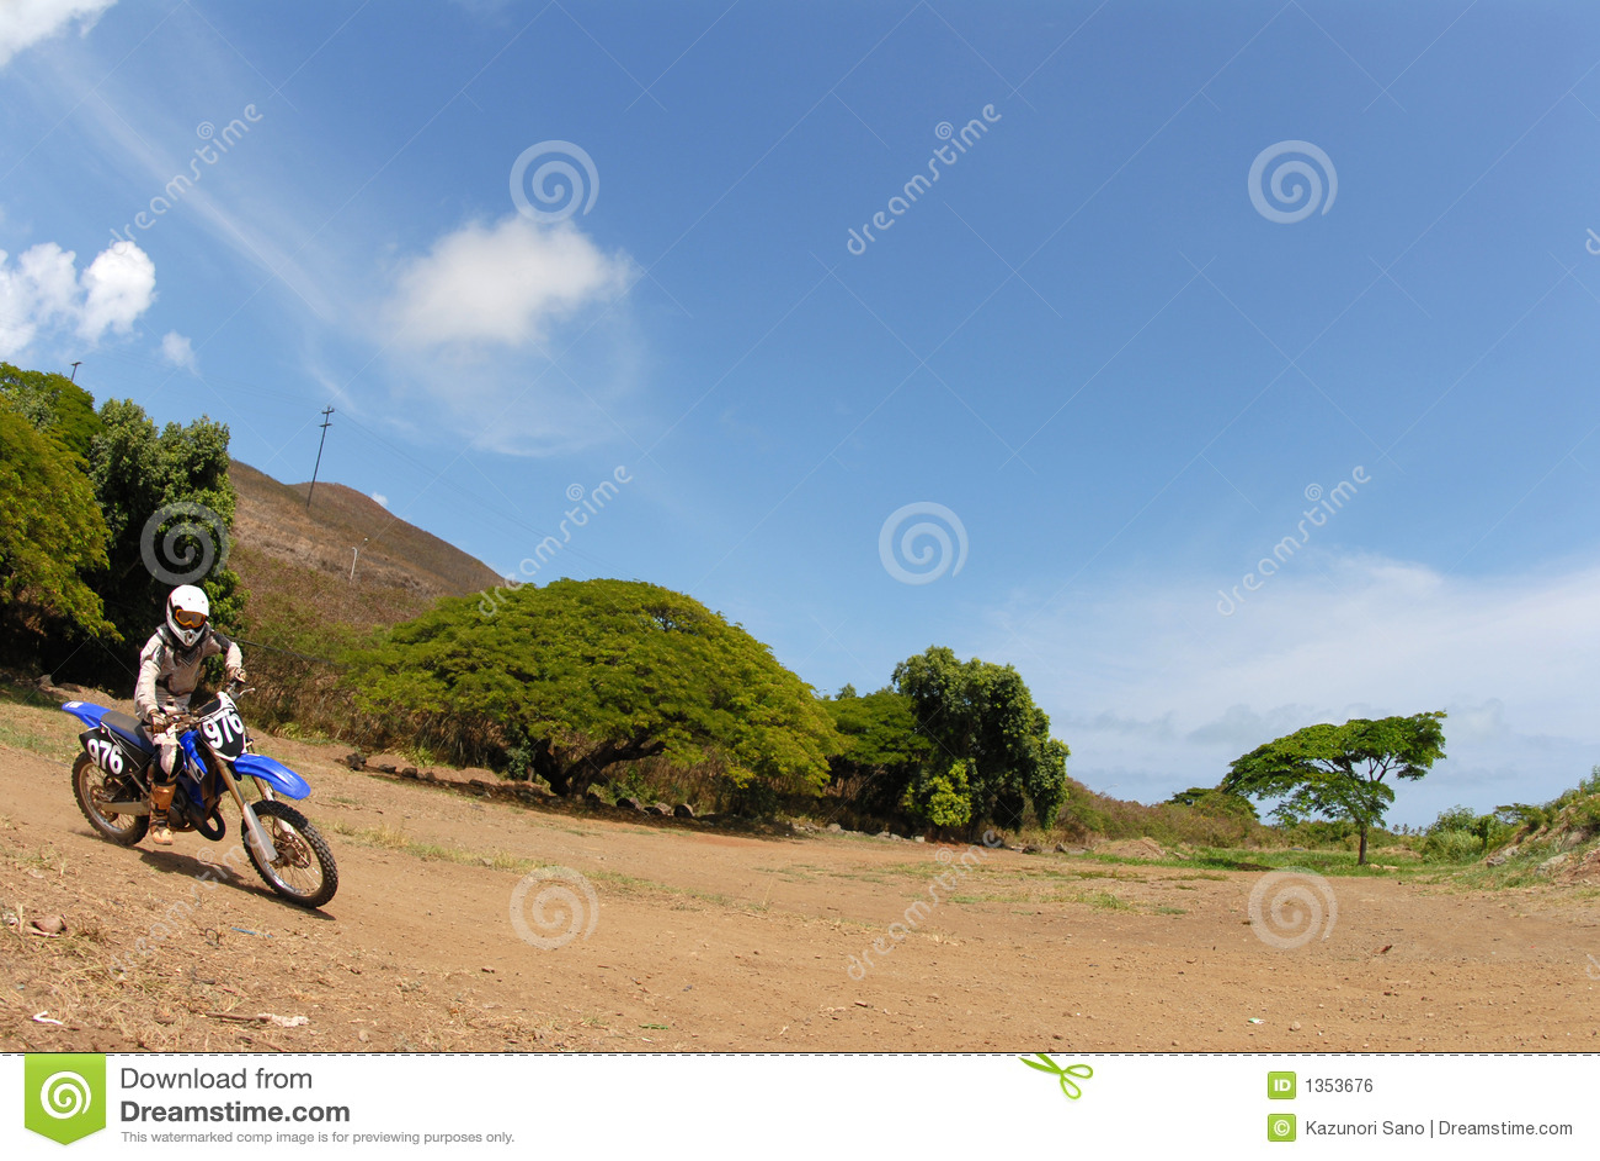 Schmutz-Fahrrad